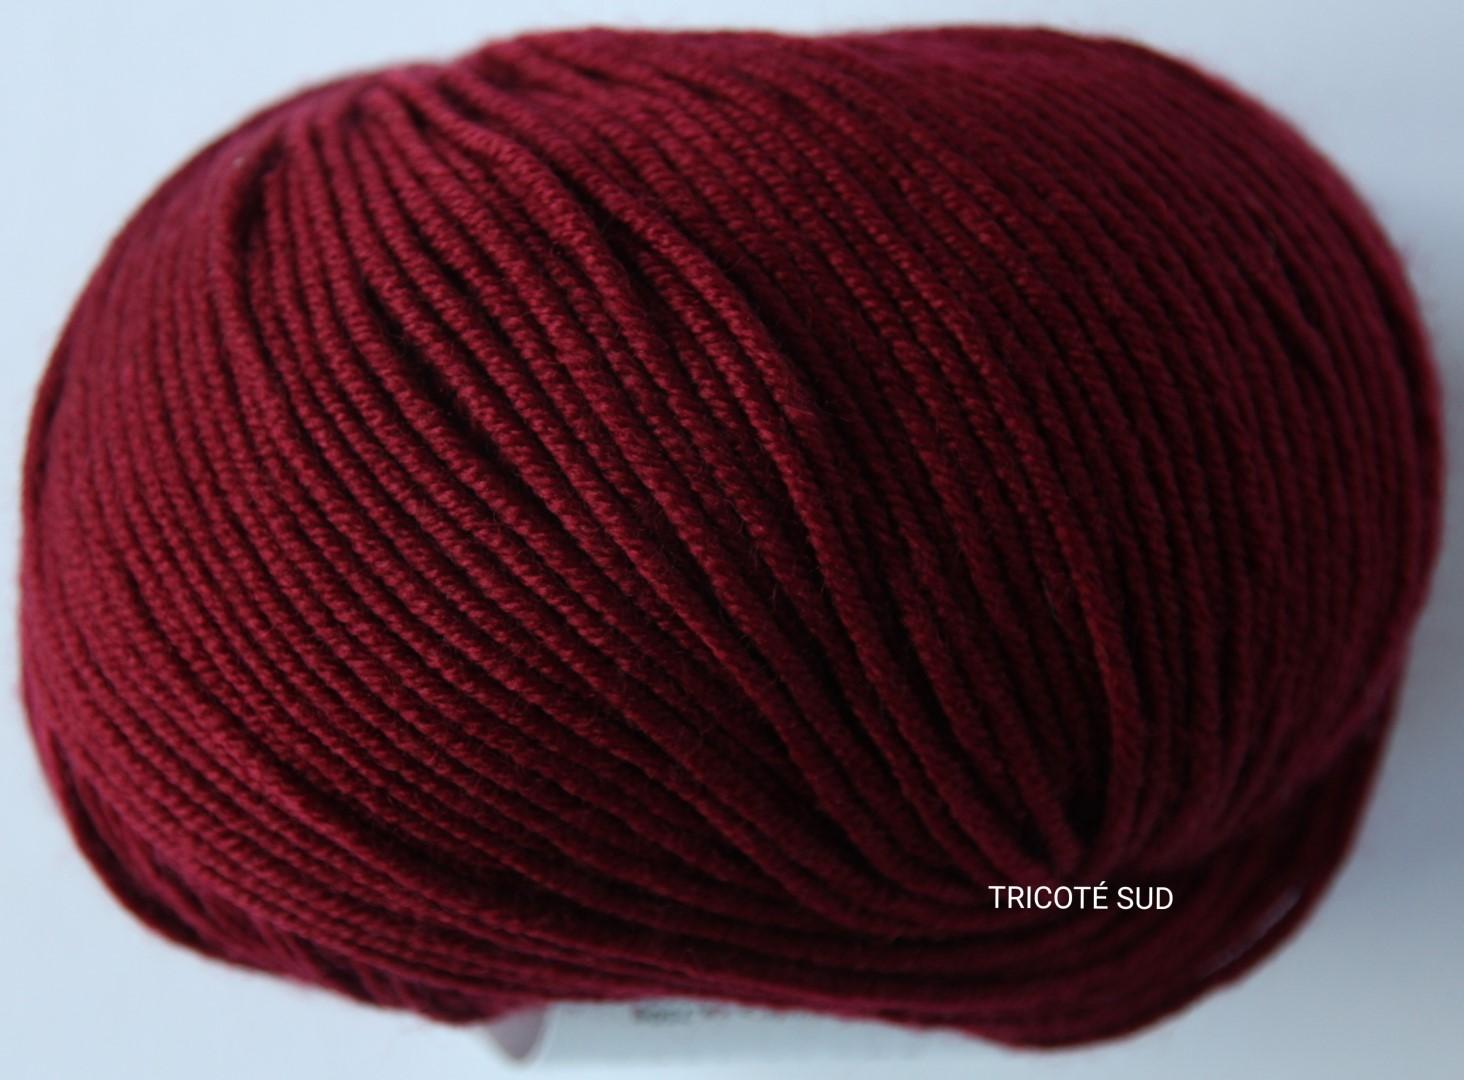 MERINO 120 COLORIS 163 (2) (Large)